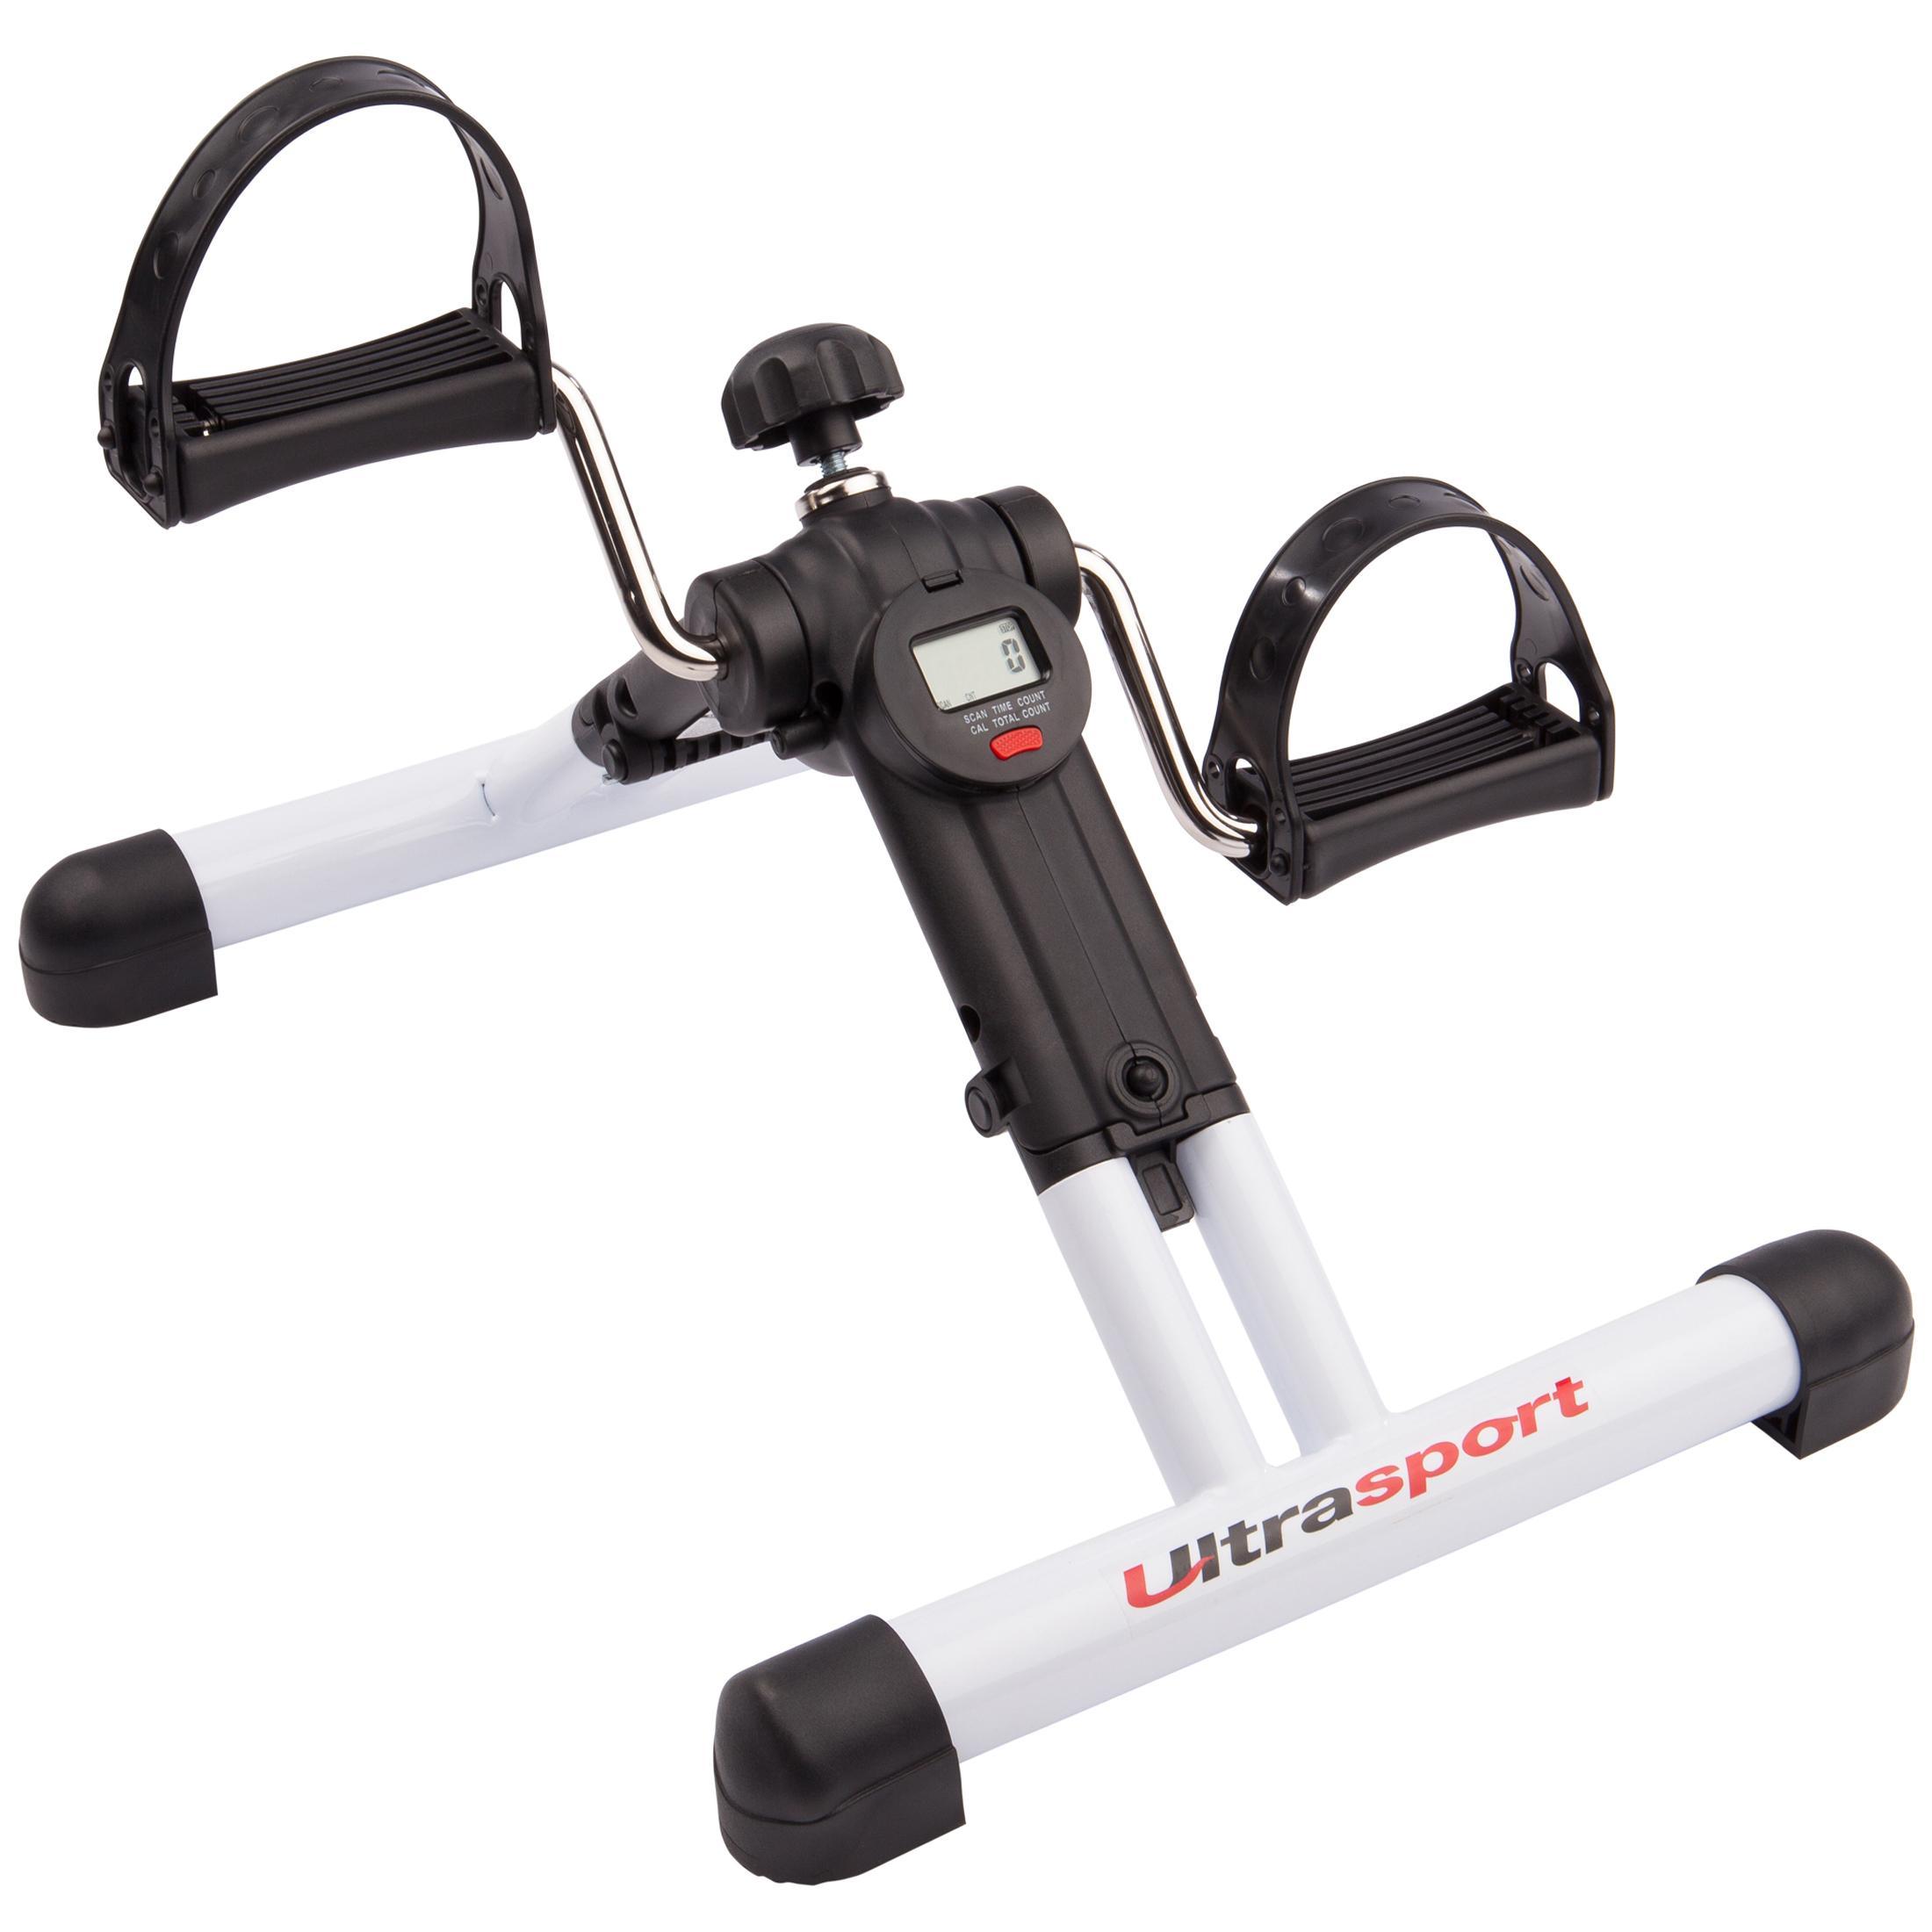 ultrasport mpe 25 klappbares mini fahrrad mini bike. Black Bedroom Furniture Sets. Home Design Ideas